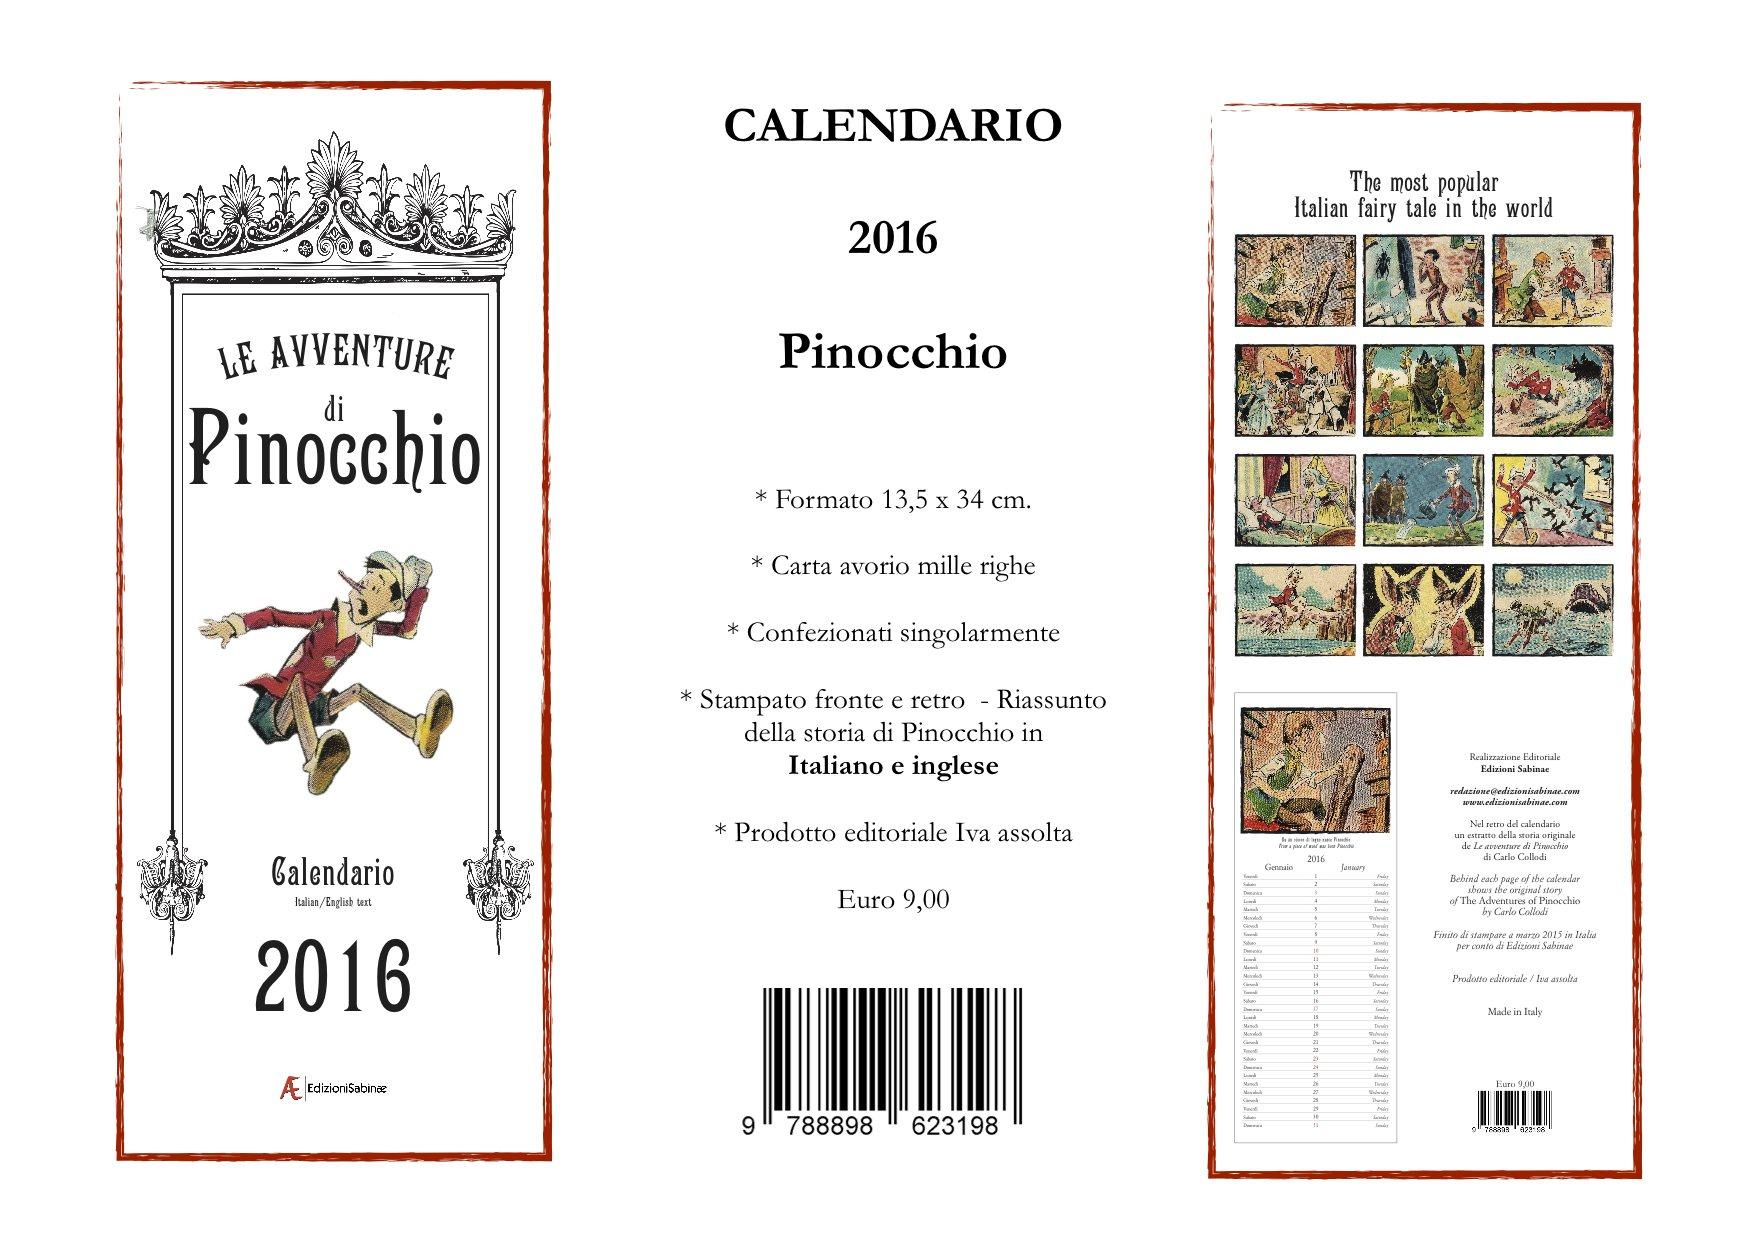 scheda Calendario Pinocchio 2016